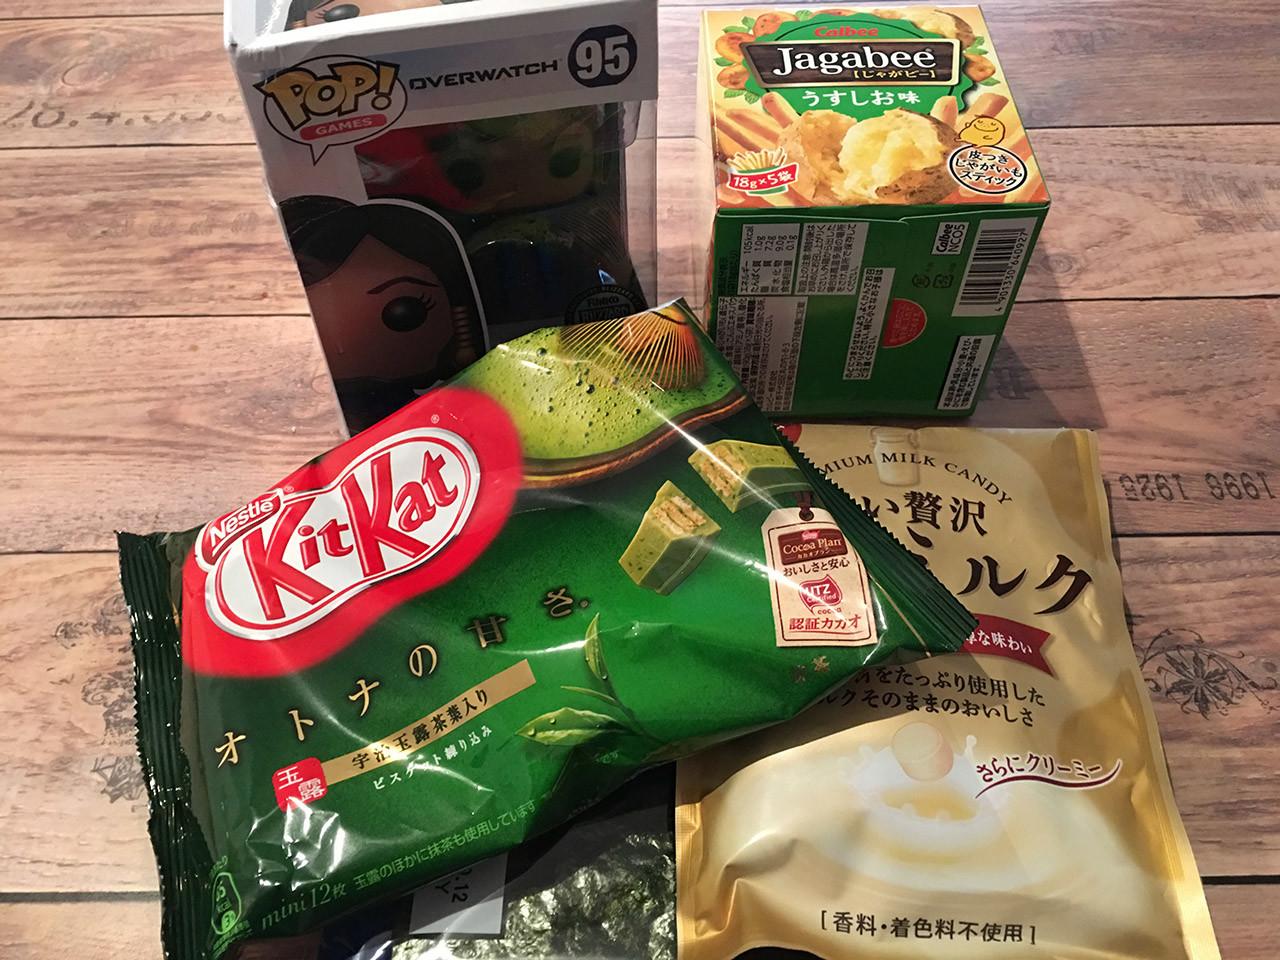 Post aus Tokio